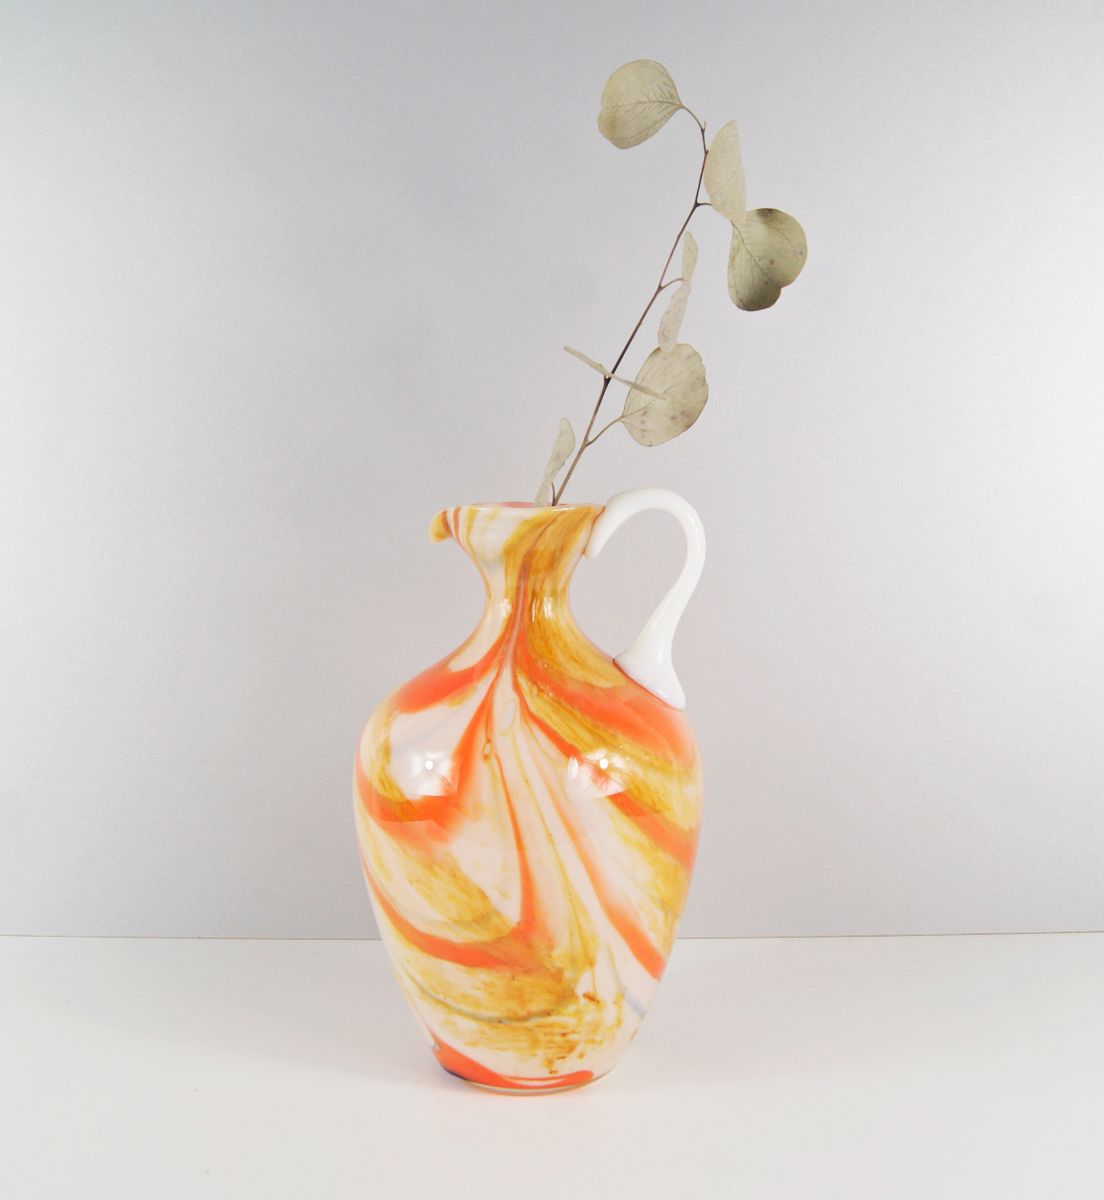 Marmorierte vintage glasvase von carlo moretti bei pamono - Glasvase vintage ...